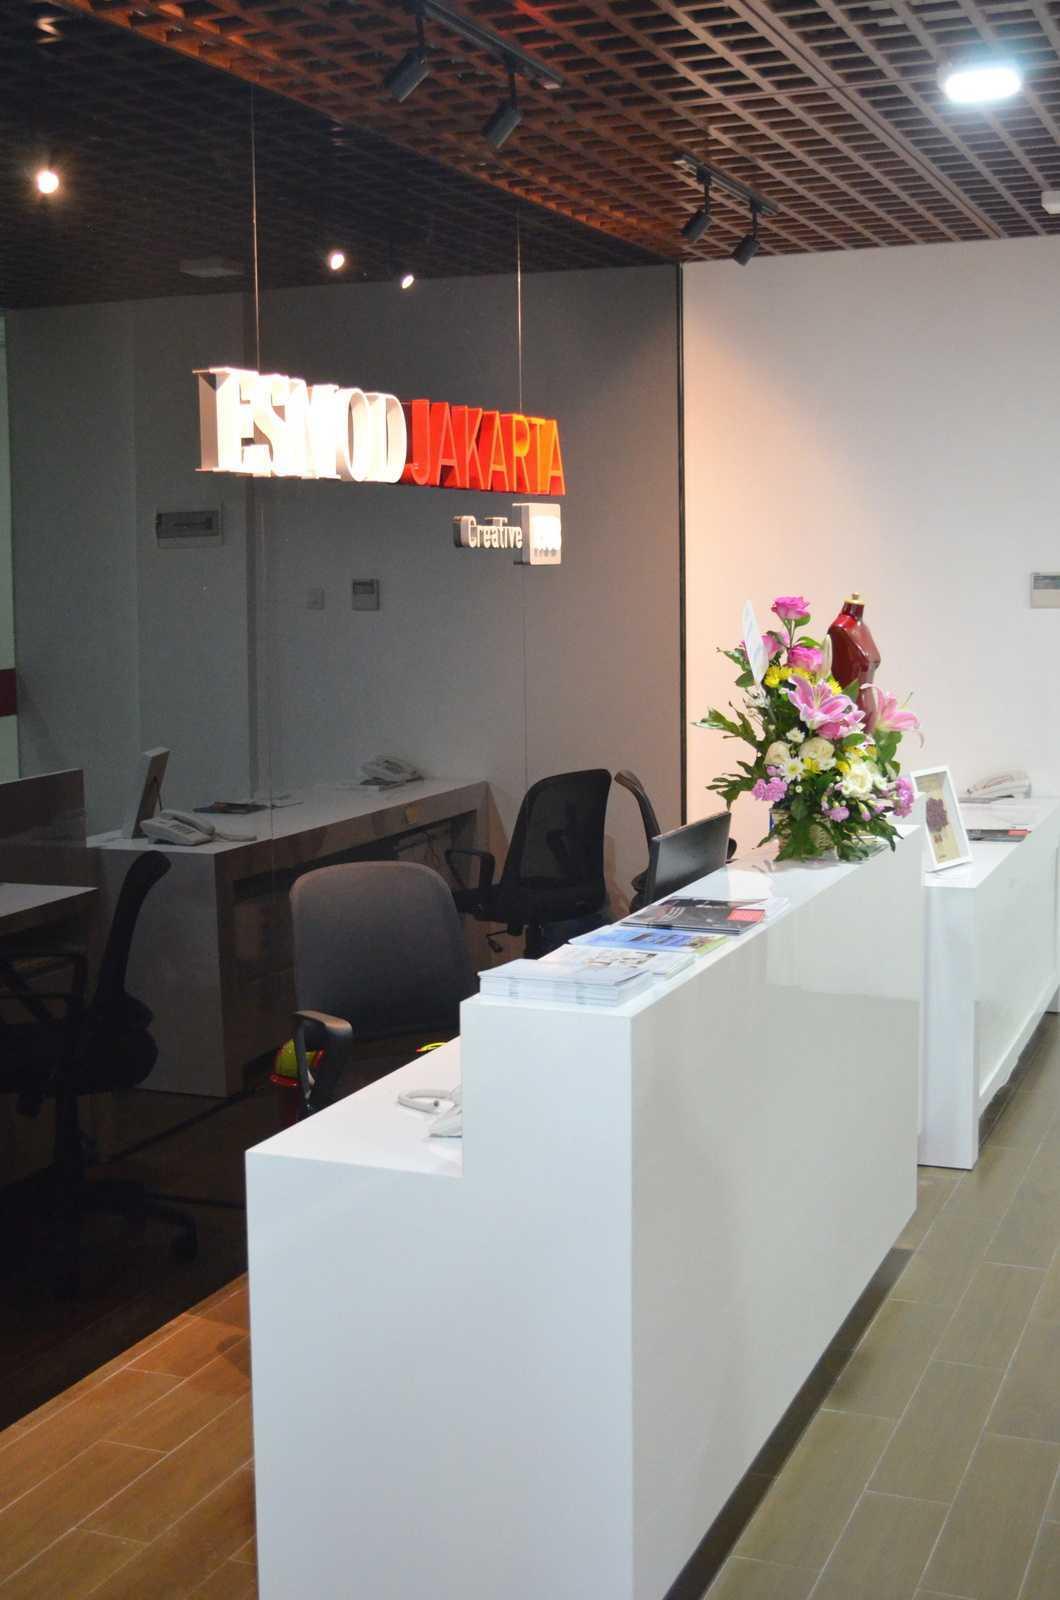 X3M Architects Esmod Creative Hub Kota Tgr. Sel., Kota Tangerang Selatan, Banten, Indonesia Kota Tgr. Sel., Kota Tangerang Selatan, Banten, Indonesia X3M-Architects-Esmod-Creative-Hub Modern  56031